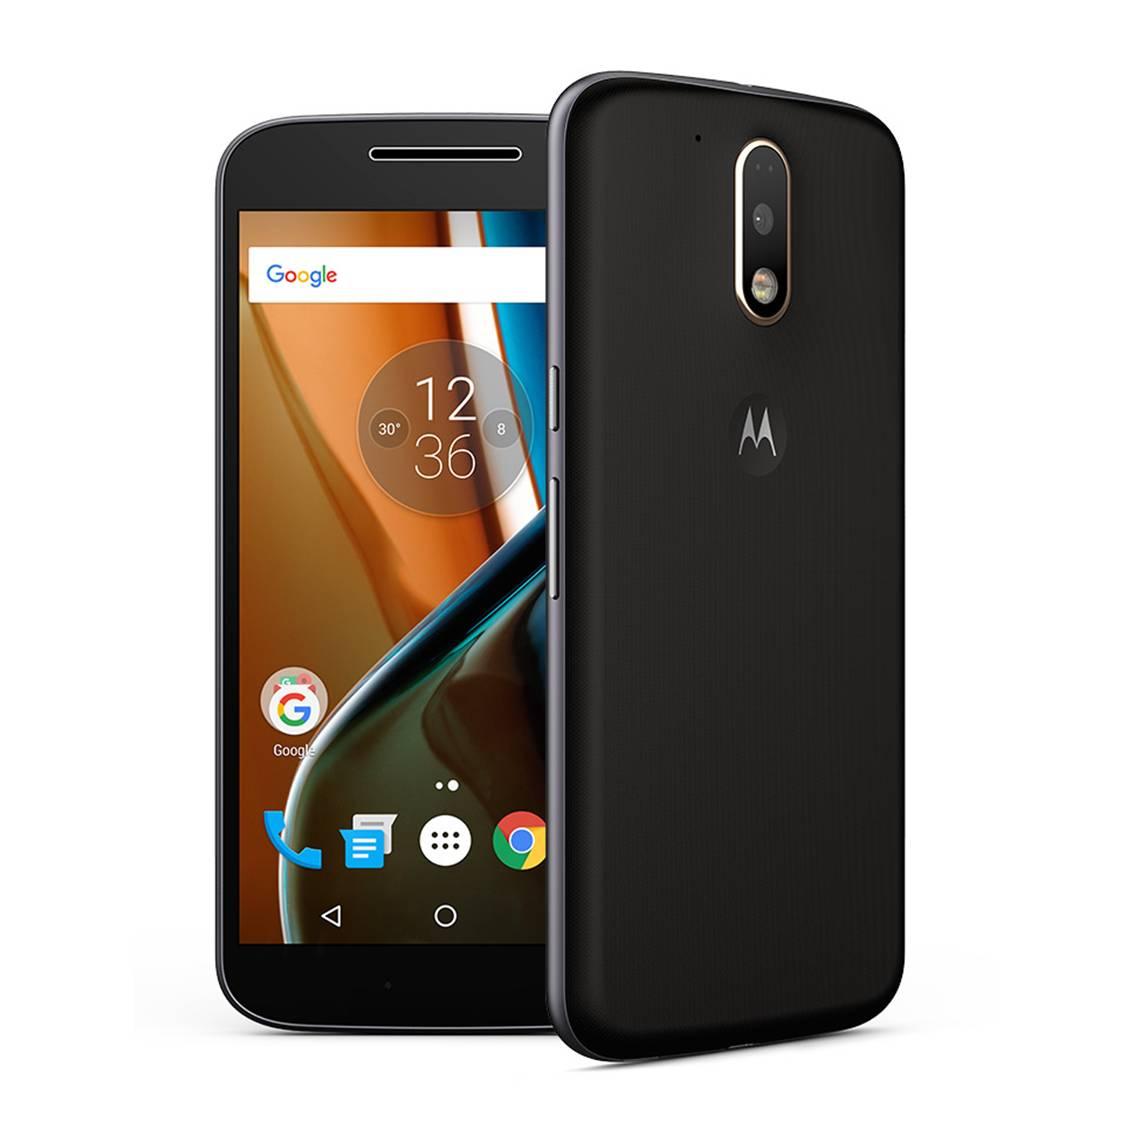 Motorola Mobiles Price 2017, Latest Models, Specifications ...